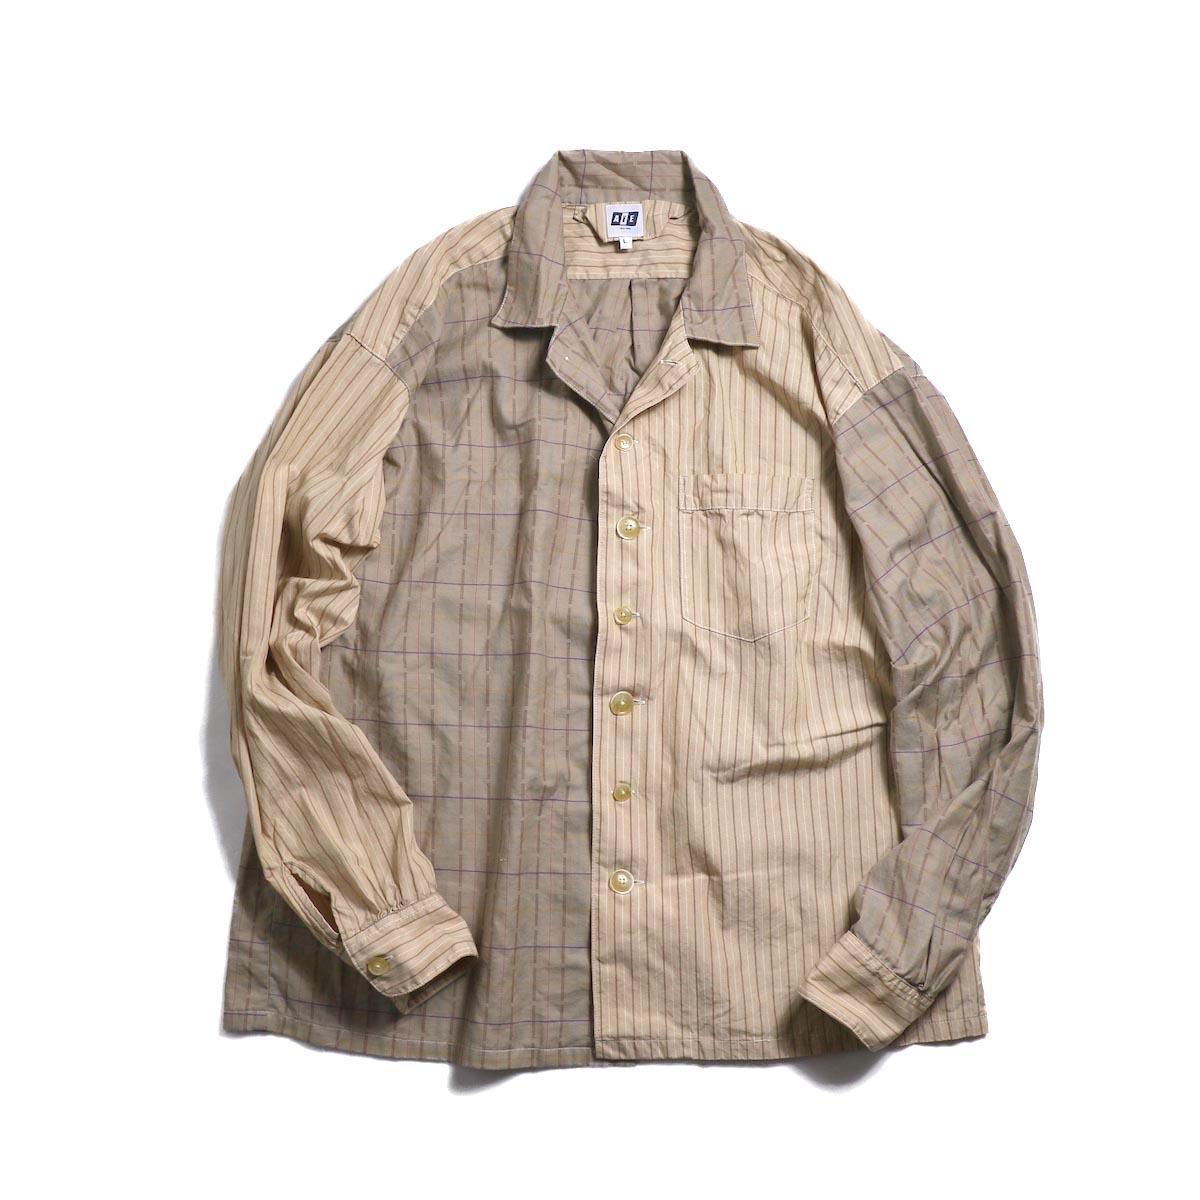 AiE / PJ Shirt -Cotton Dobby Check (Brown)